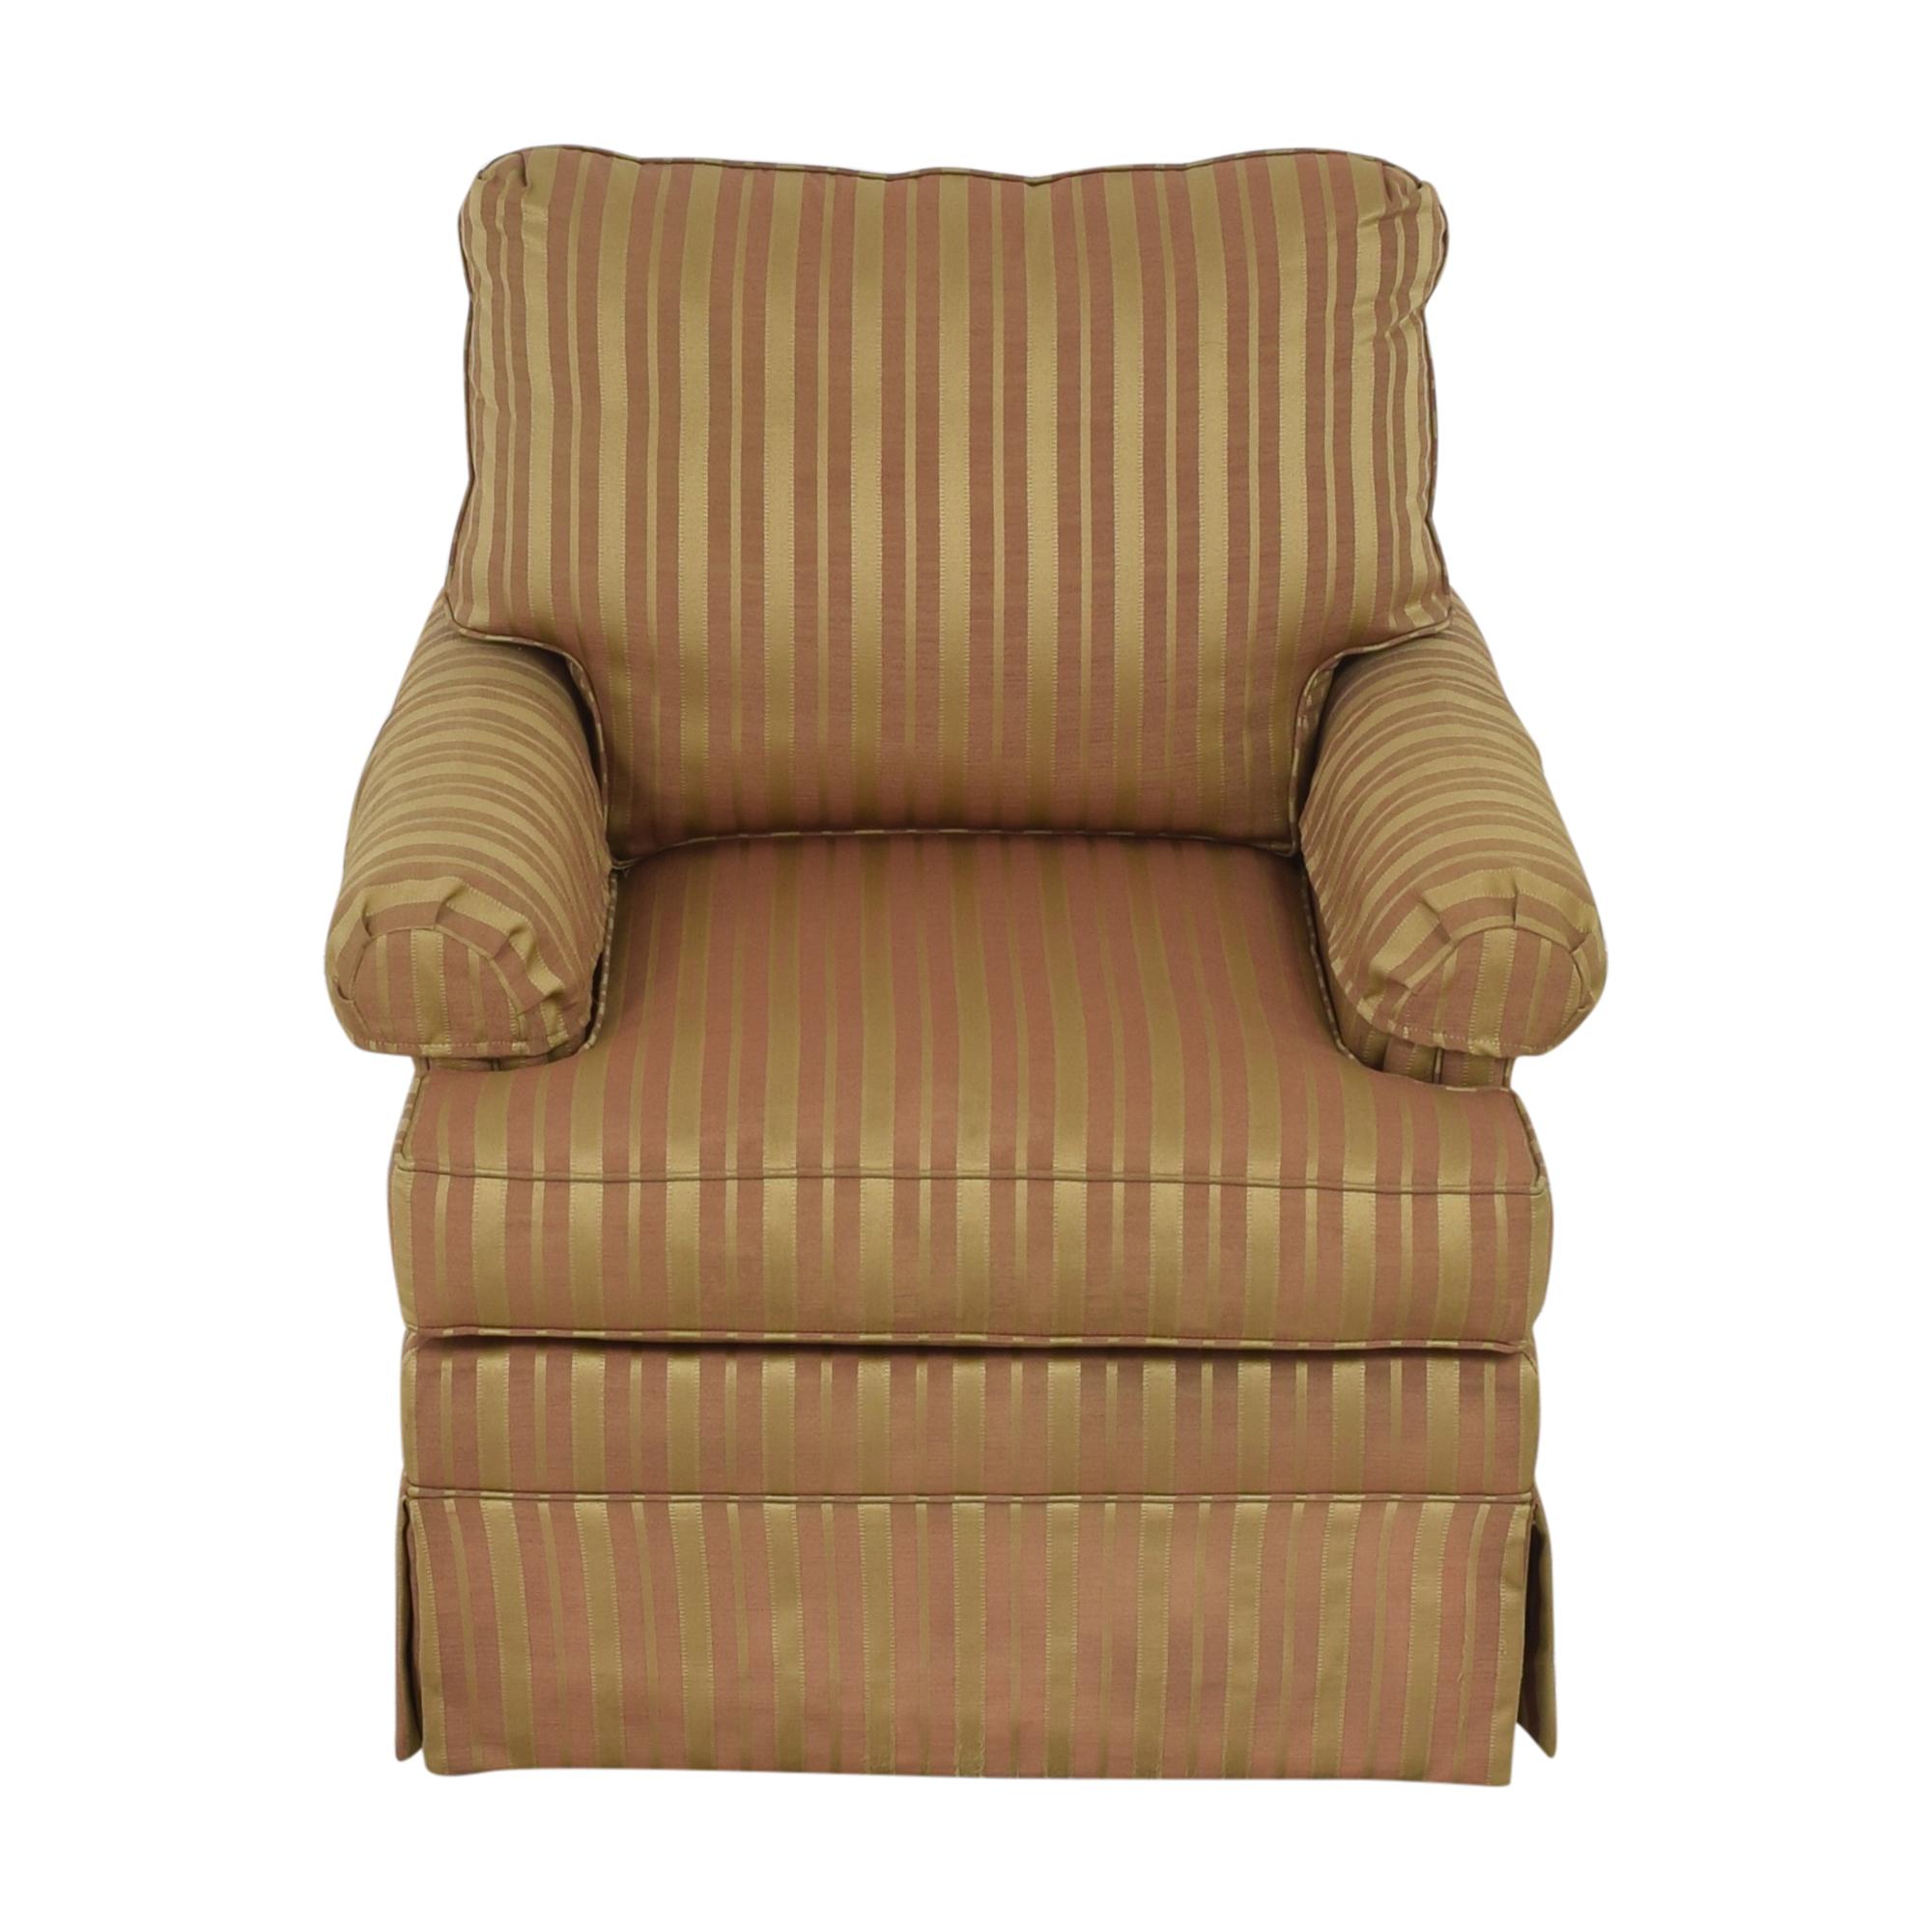 Ethan Allen Ethan Allen Mr. Chair Chairs